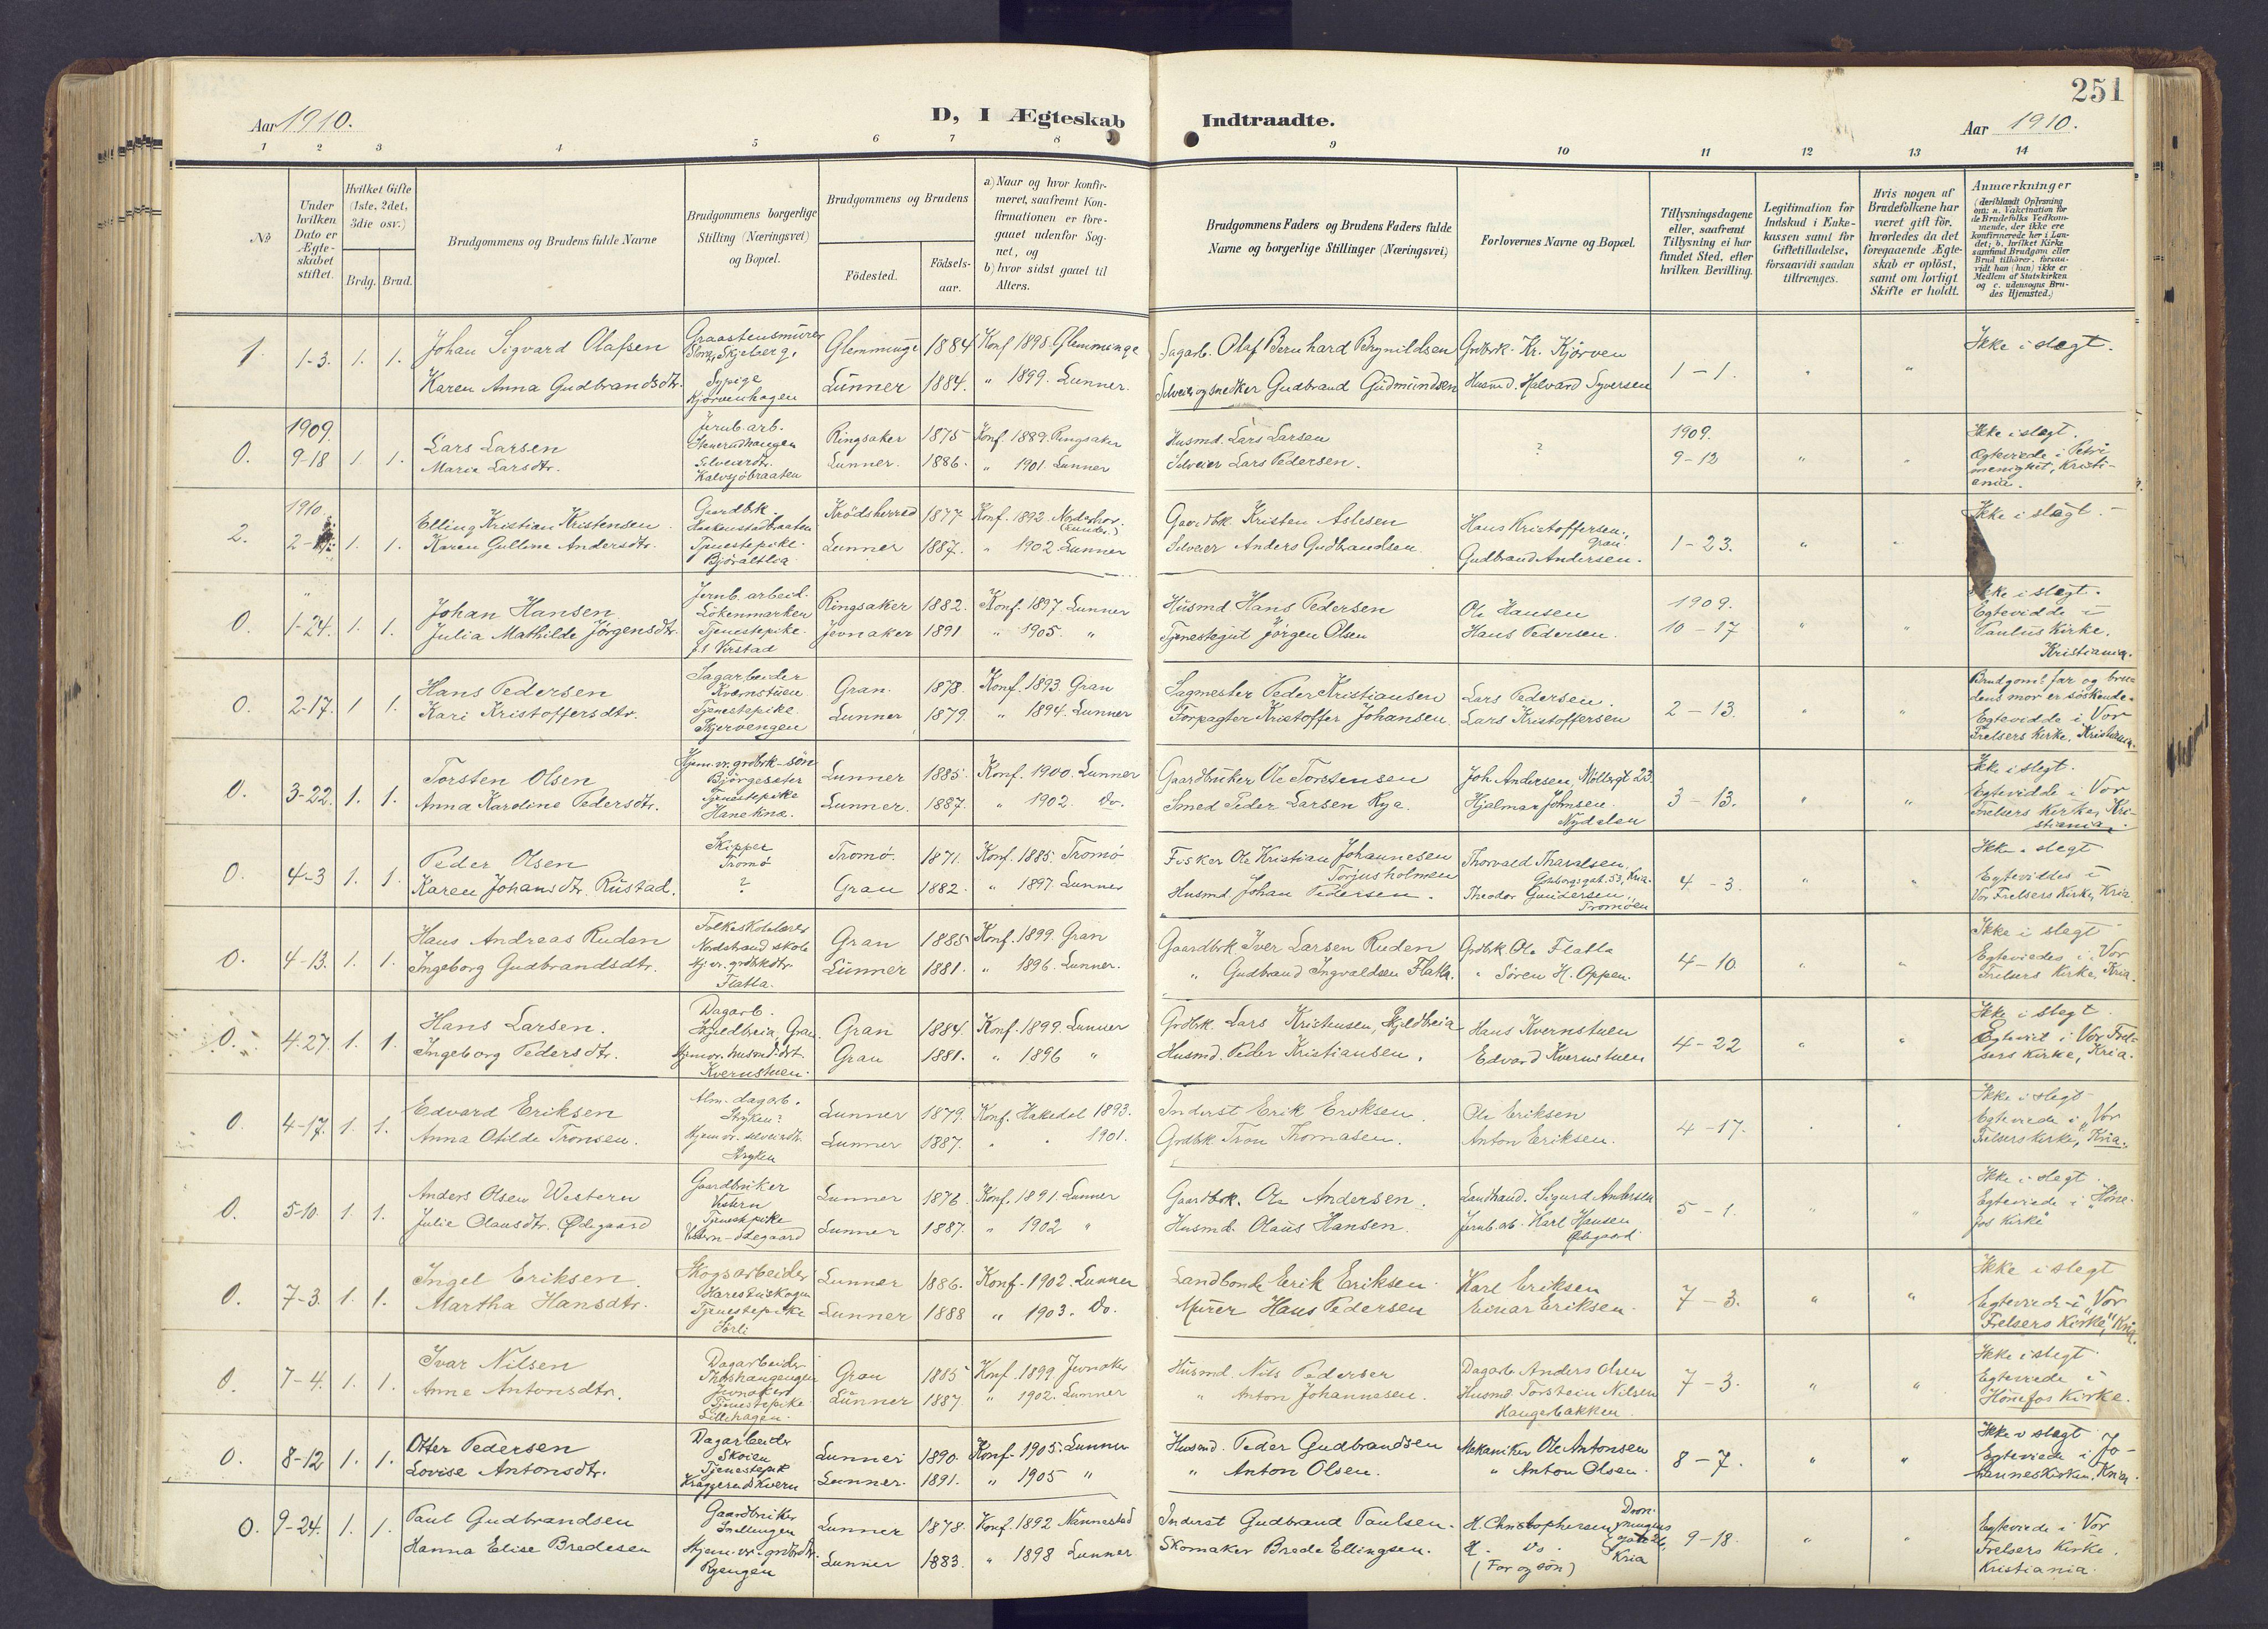 SAH, Lunner prestekontor, H/Ha/Haa/L0001: Ministerialbok nr. 1, 1907-1922, s. 251